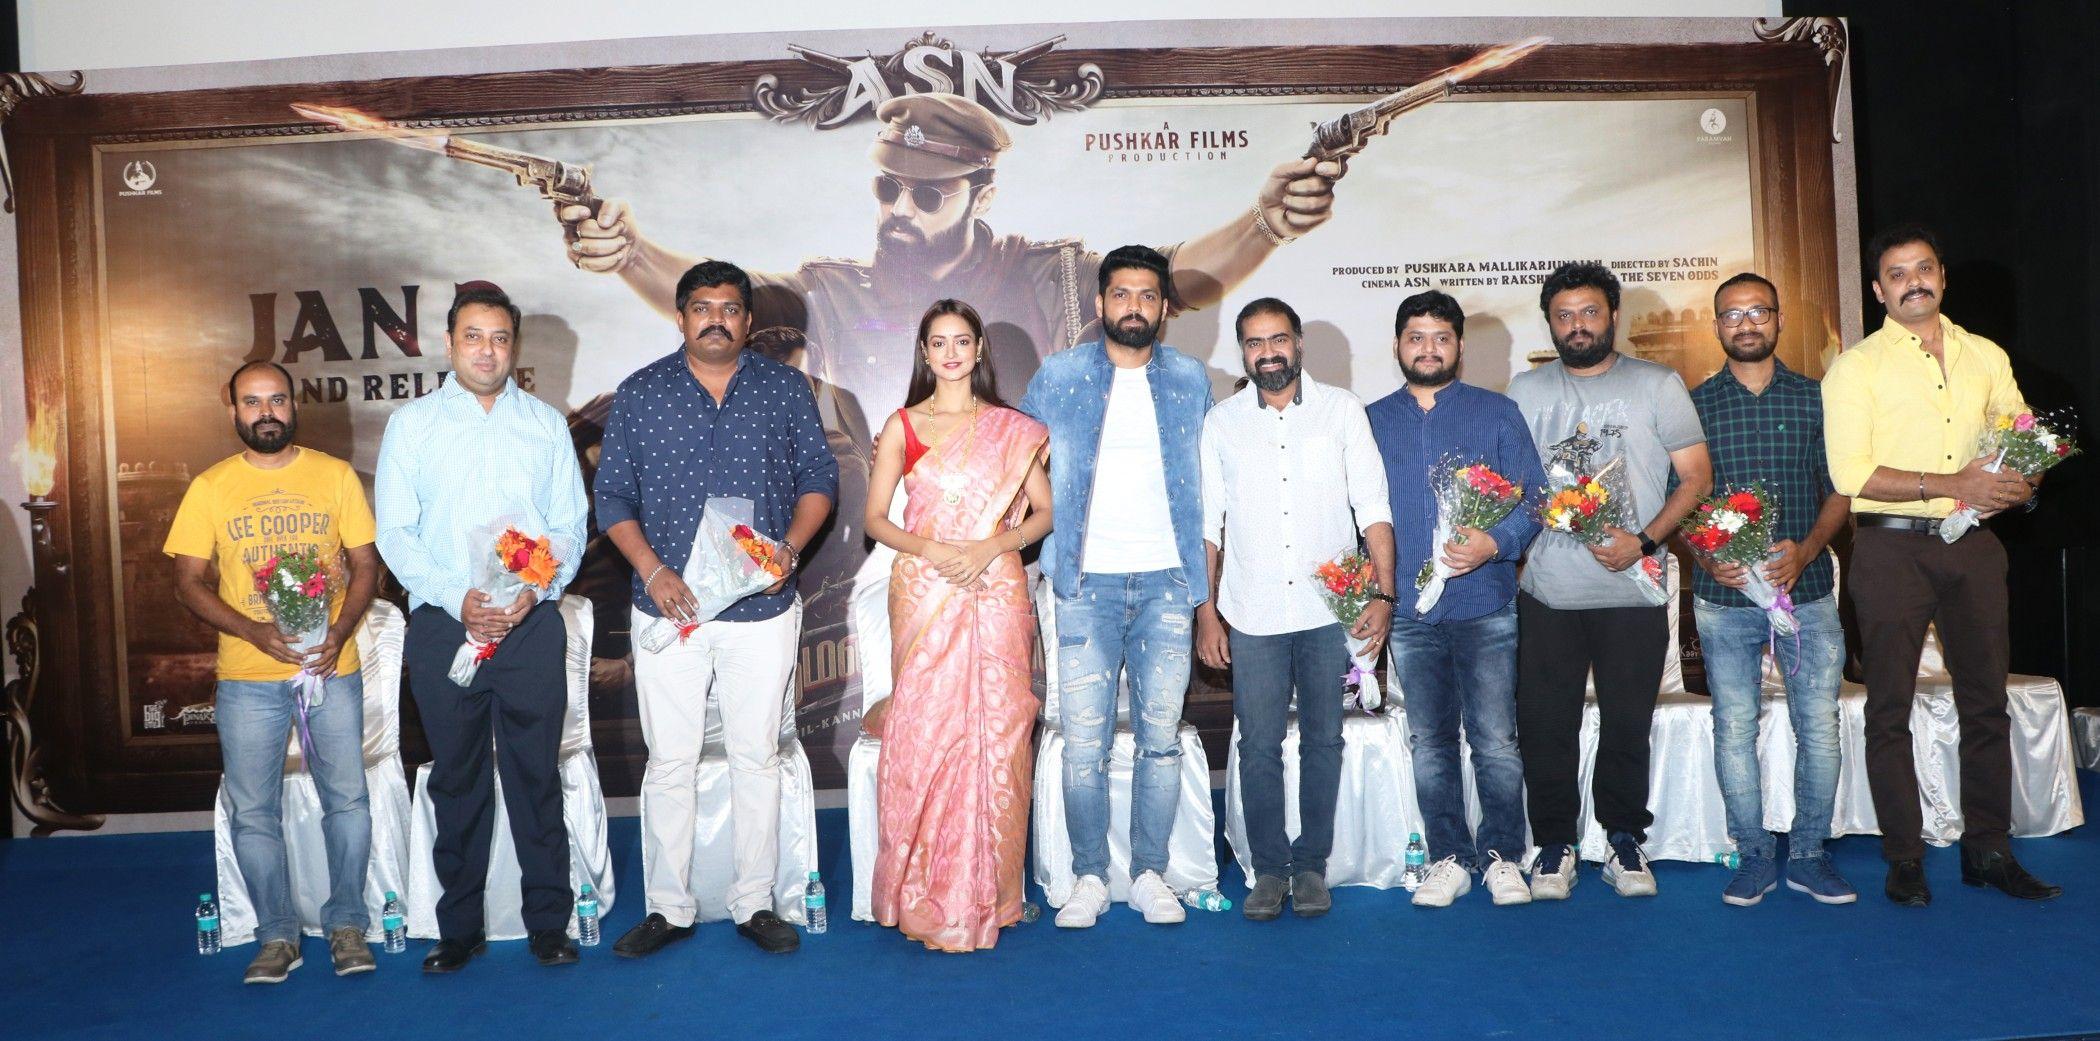 Pushkar Films Pushkara Mallikarjunaiah Presents Avane Srimannarayana Press Meet Stills Tamil Gallery